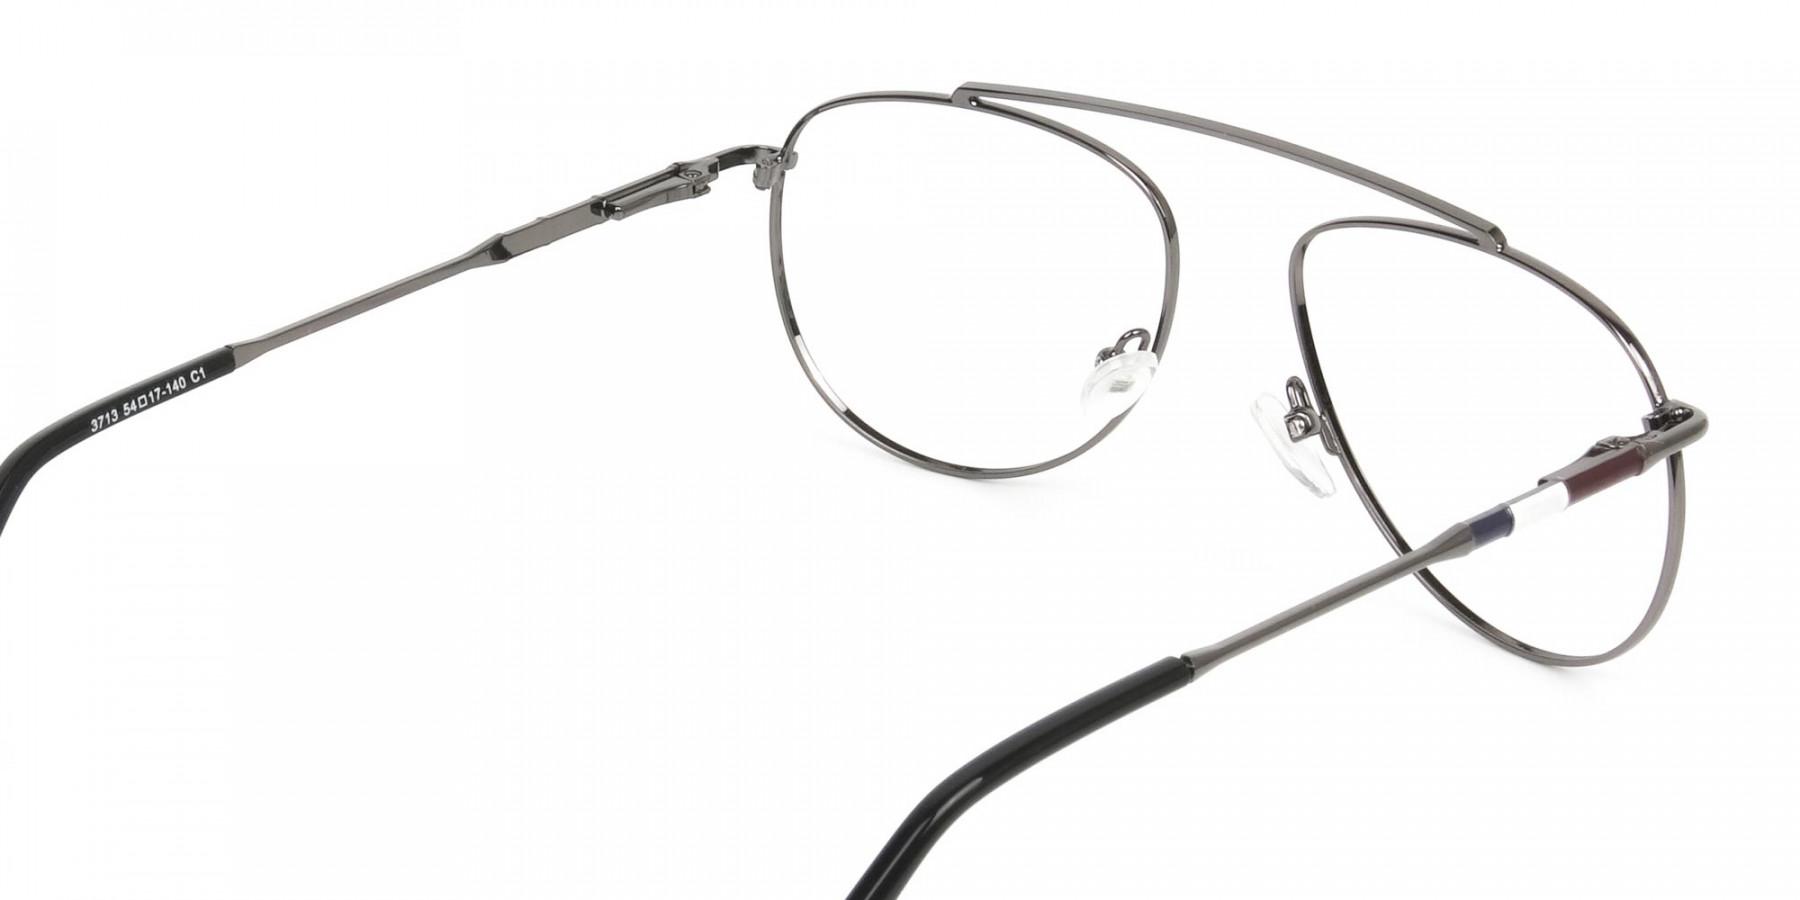 Silver & Dark Navy Thin Metal Aviator Frame Glasses - 1